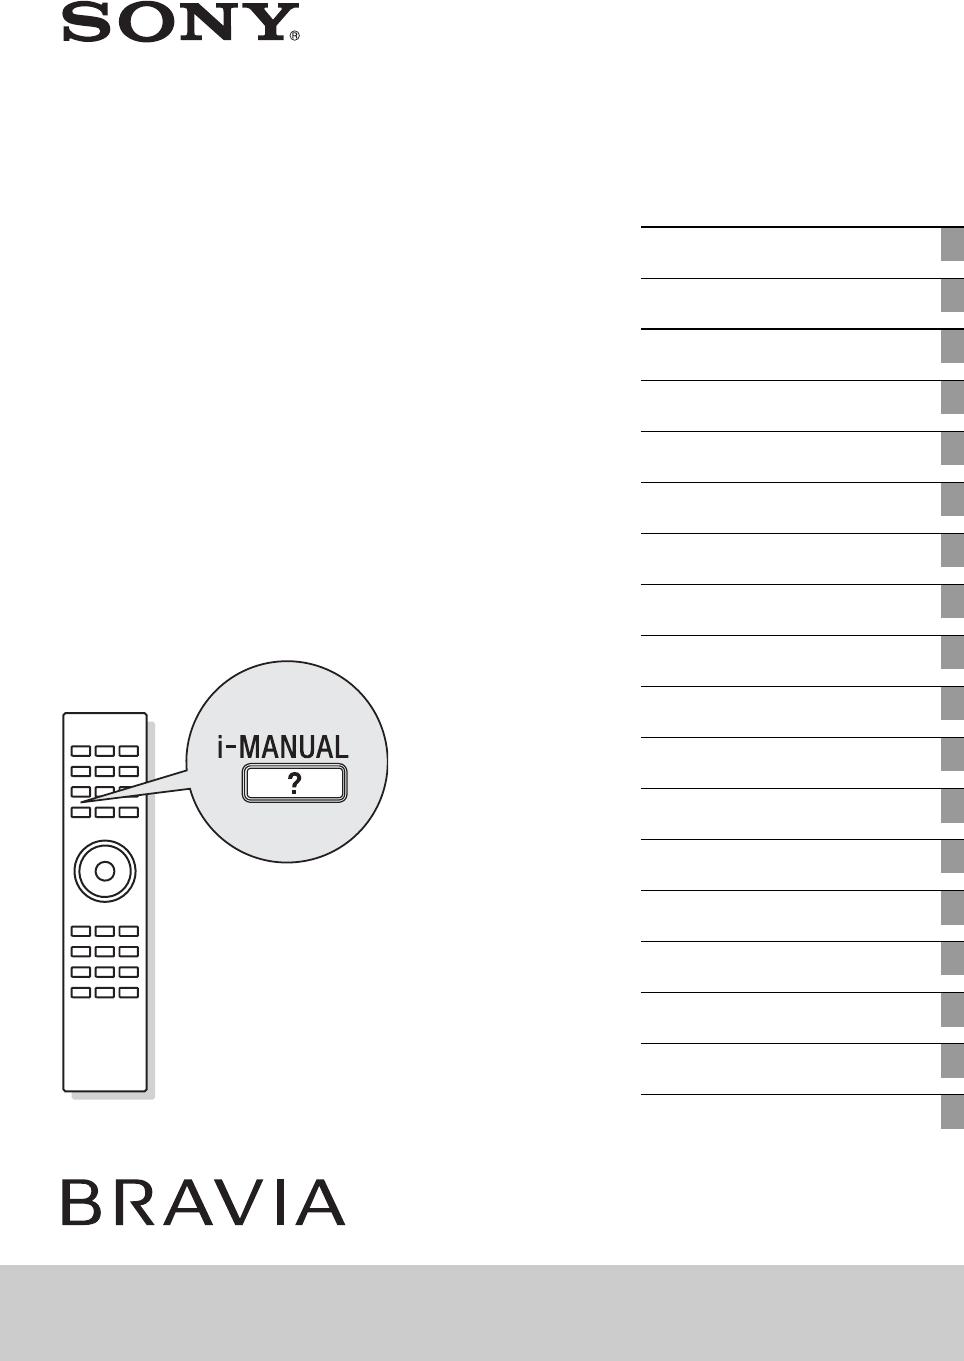 Manuale Sony Bravia KDL-37EX500 (332 pagine)